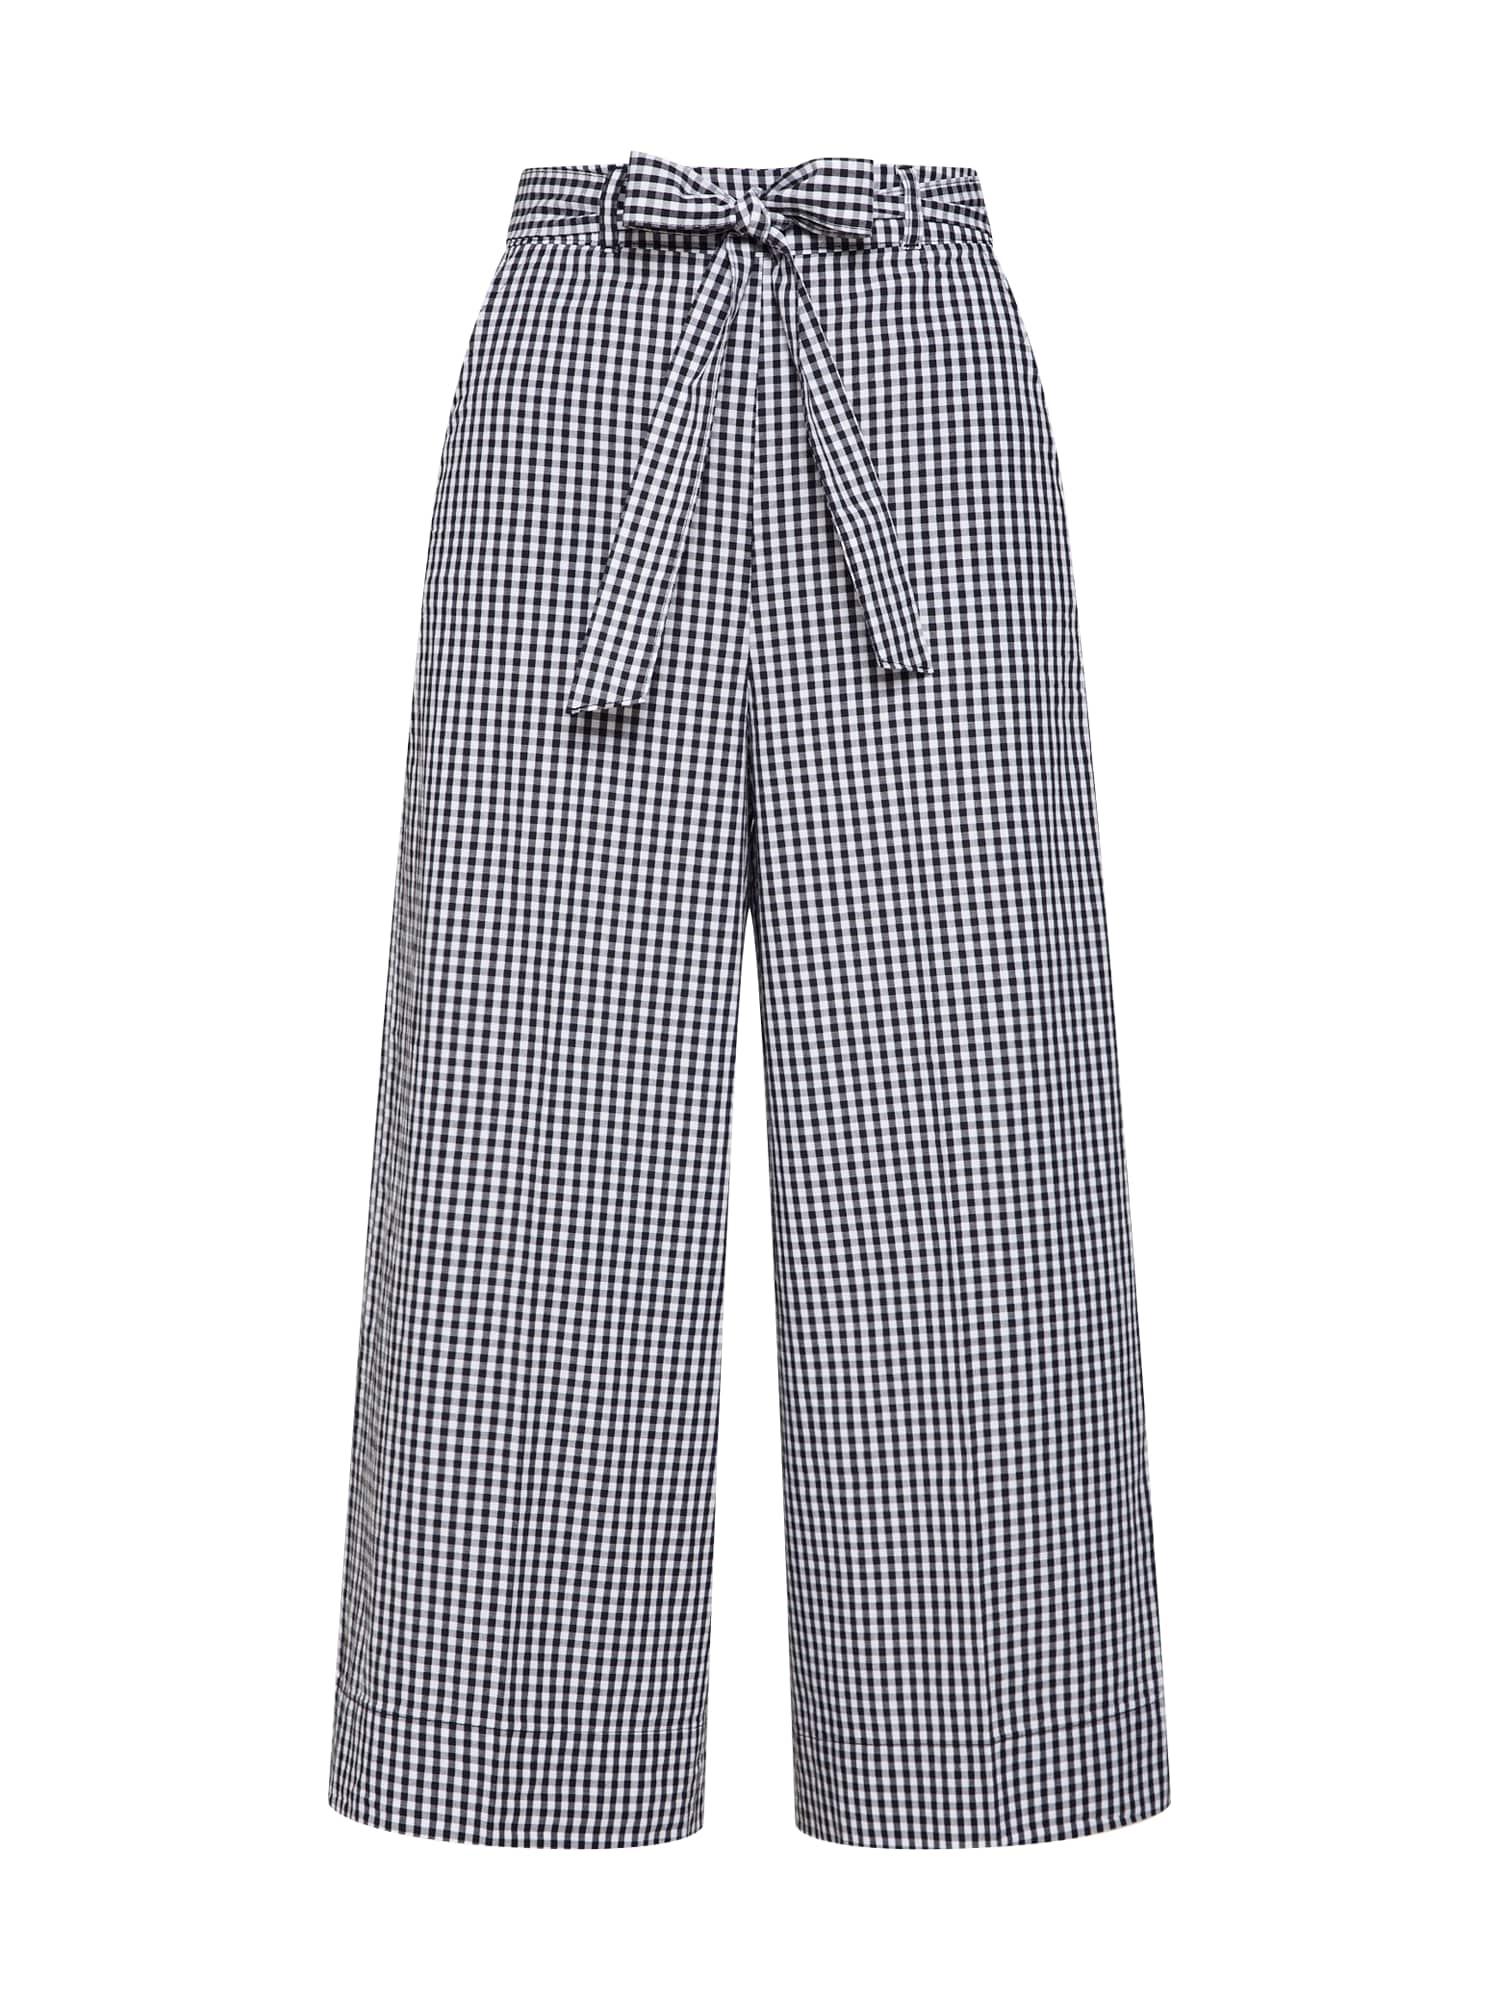 Kalhoty 10253316 černá bílá ARMEDANGELS